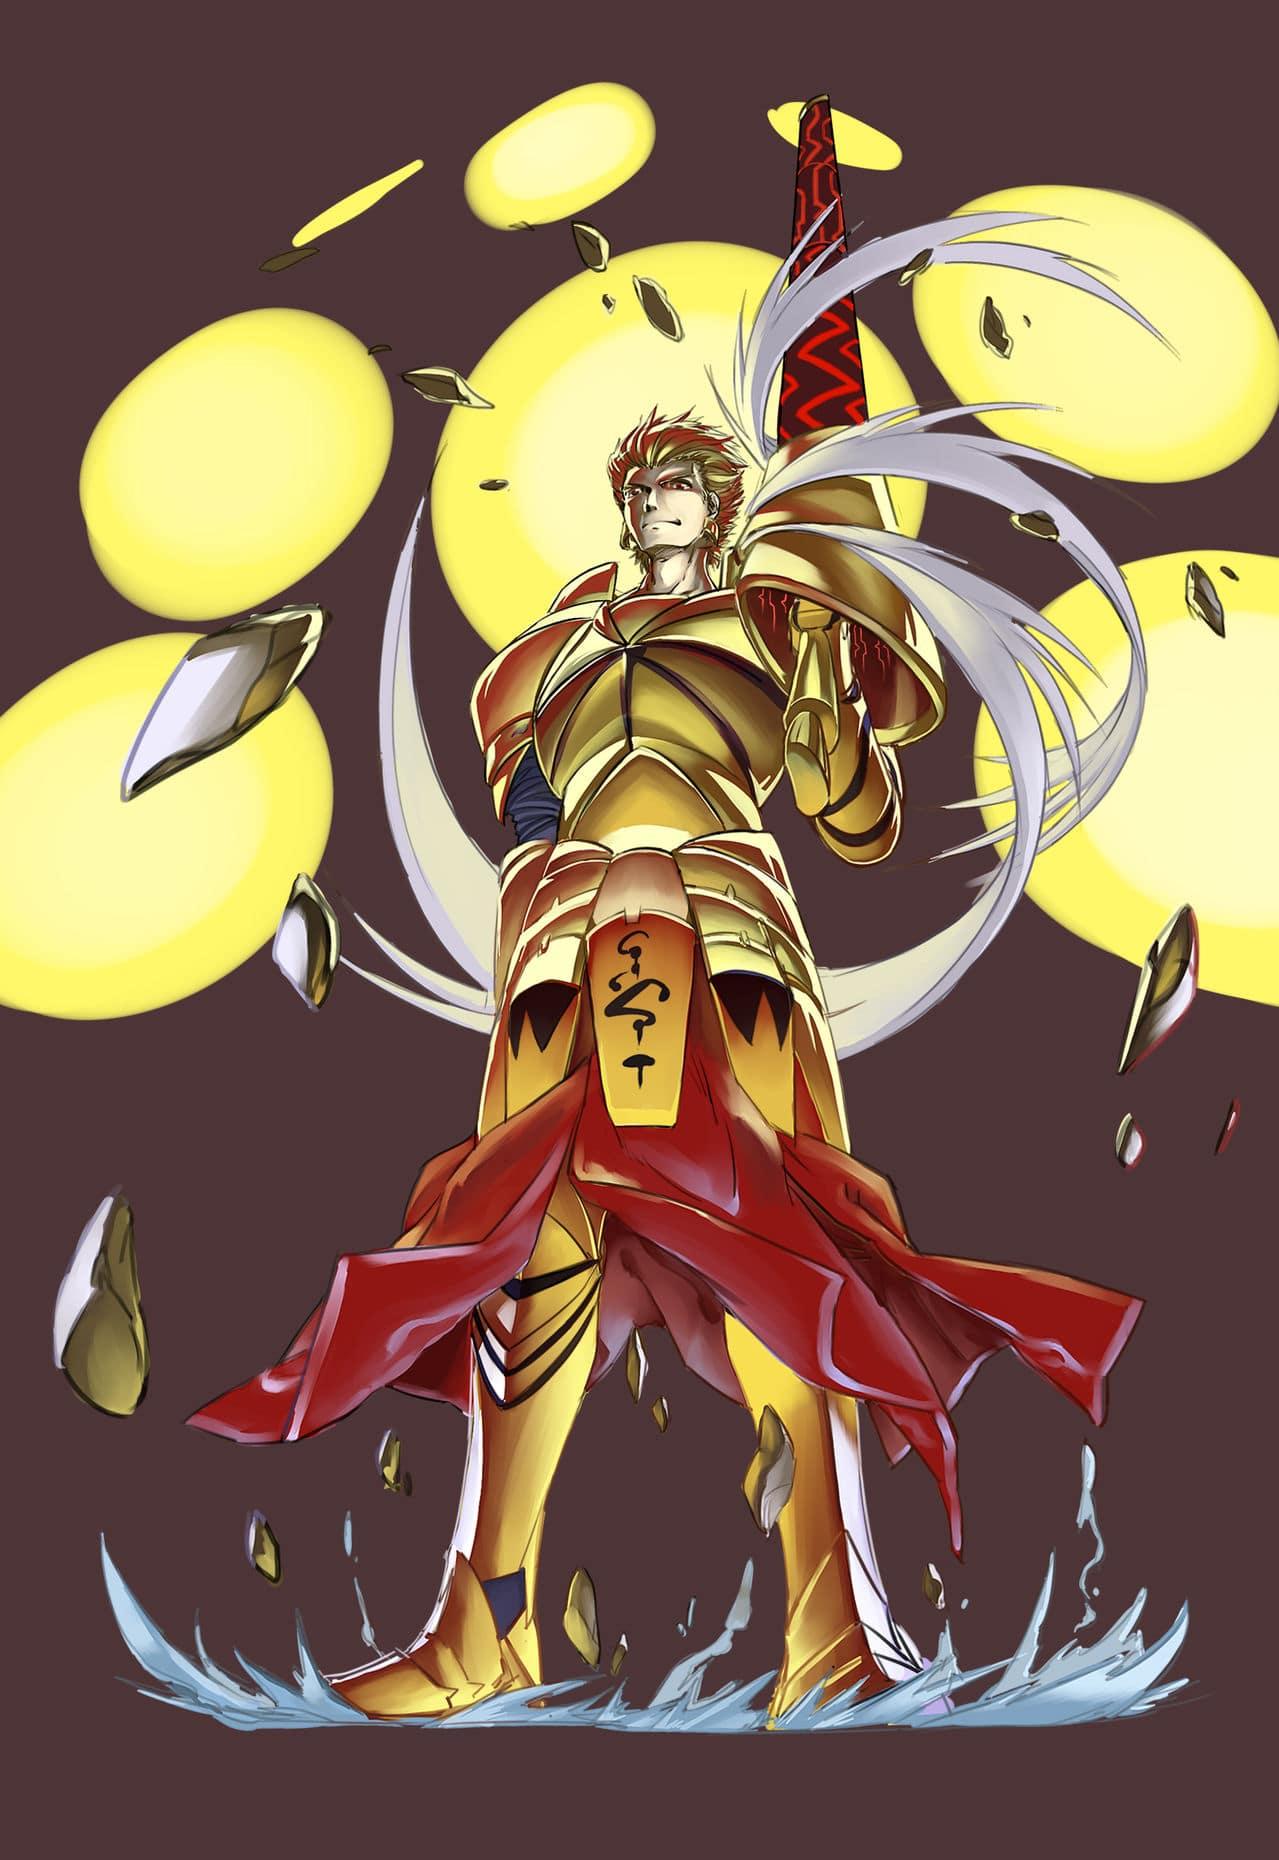 Ba'al, the Original King Gilgamesh_full_1320846